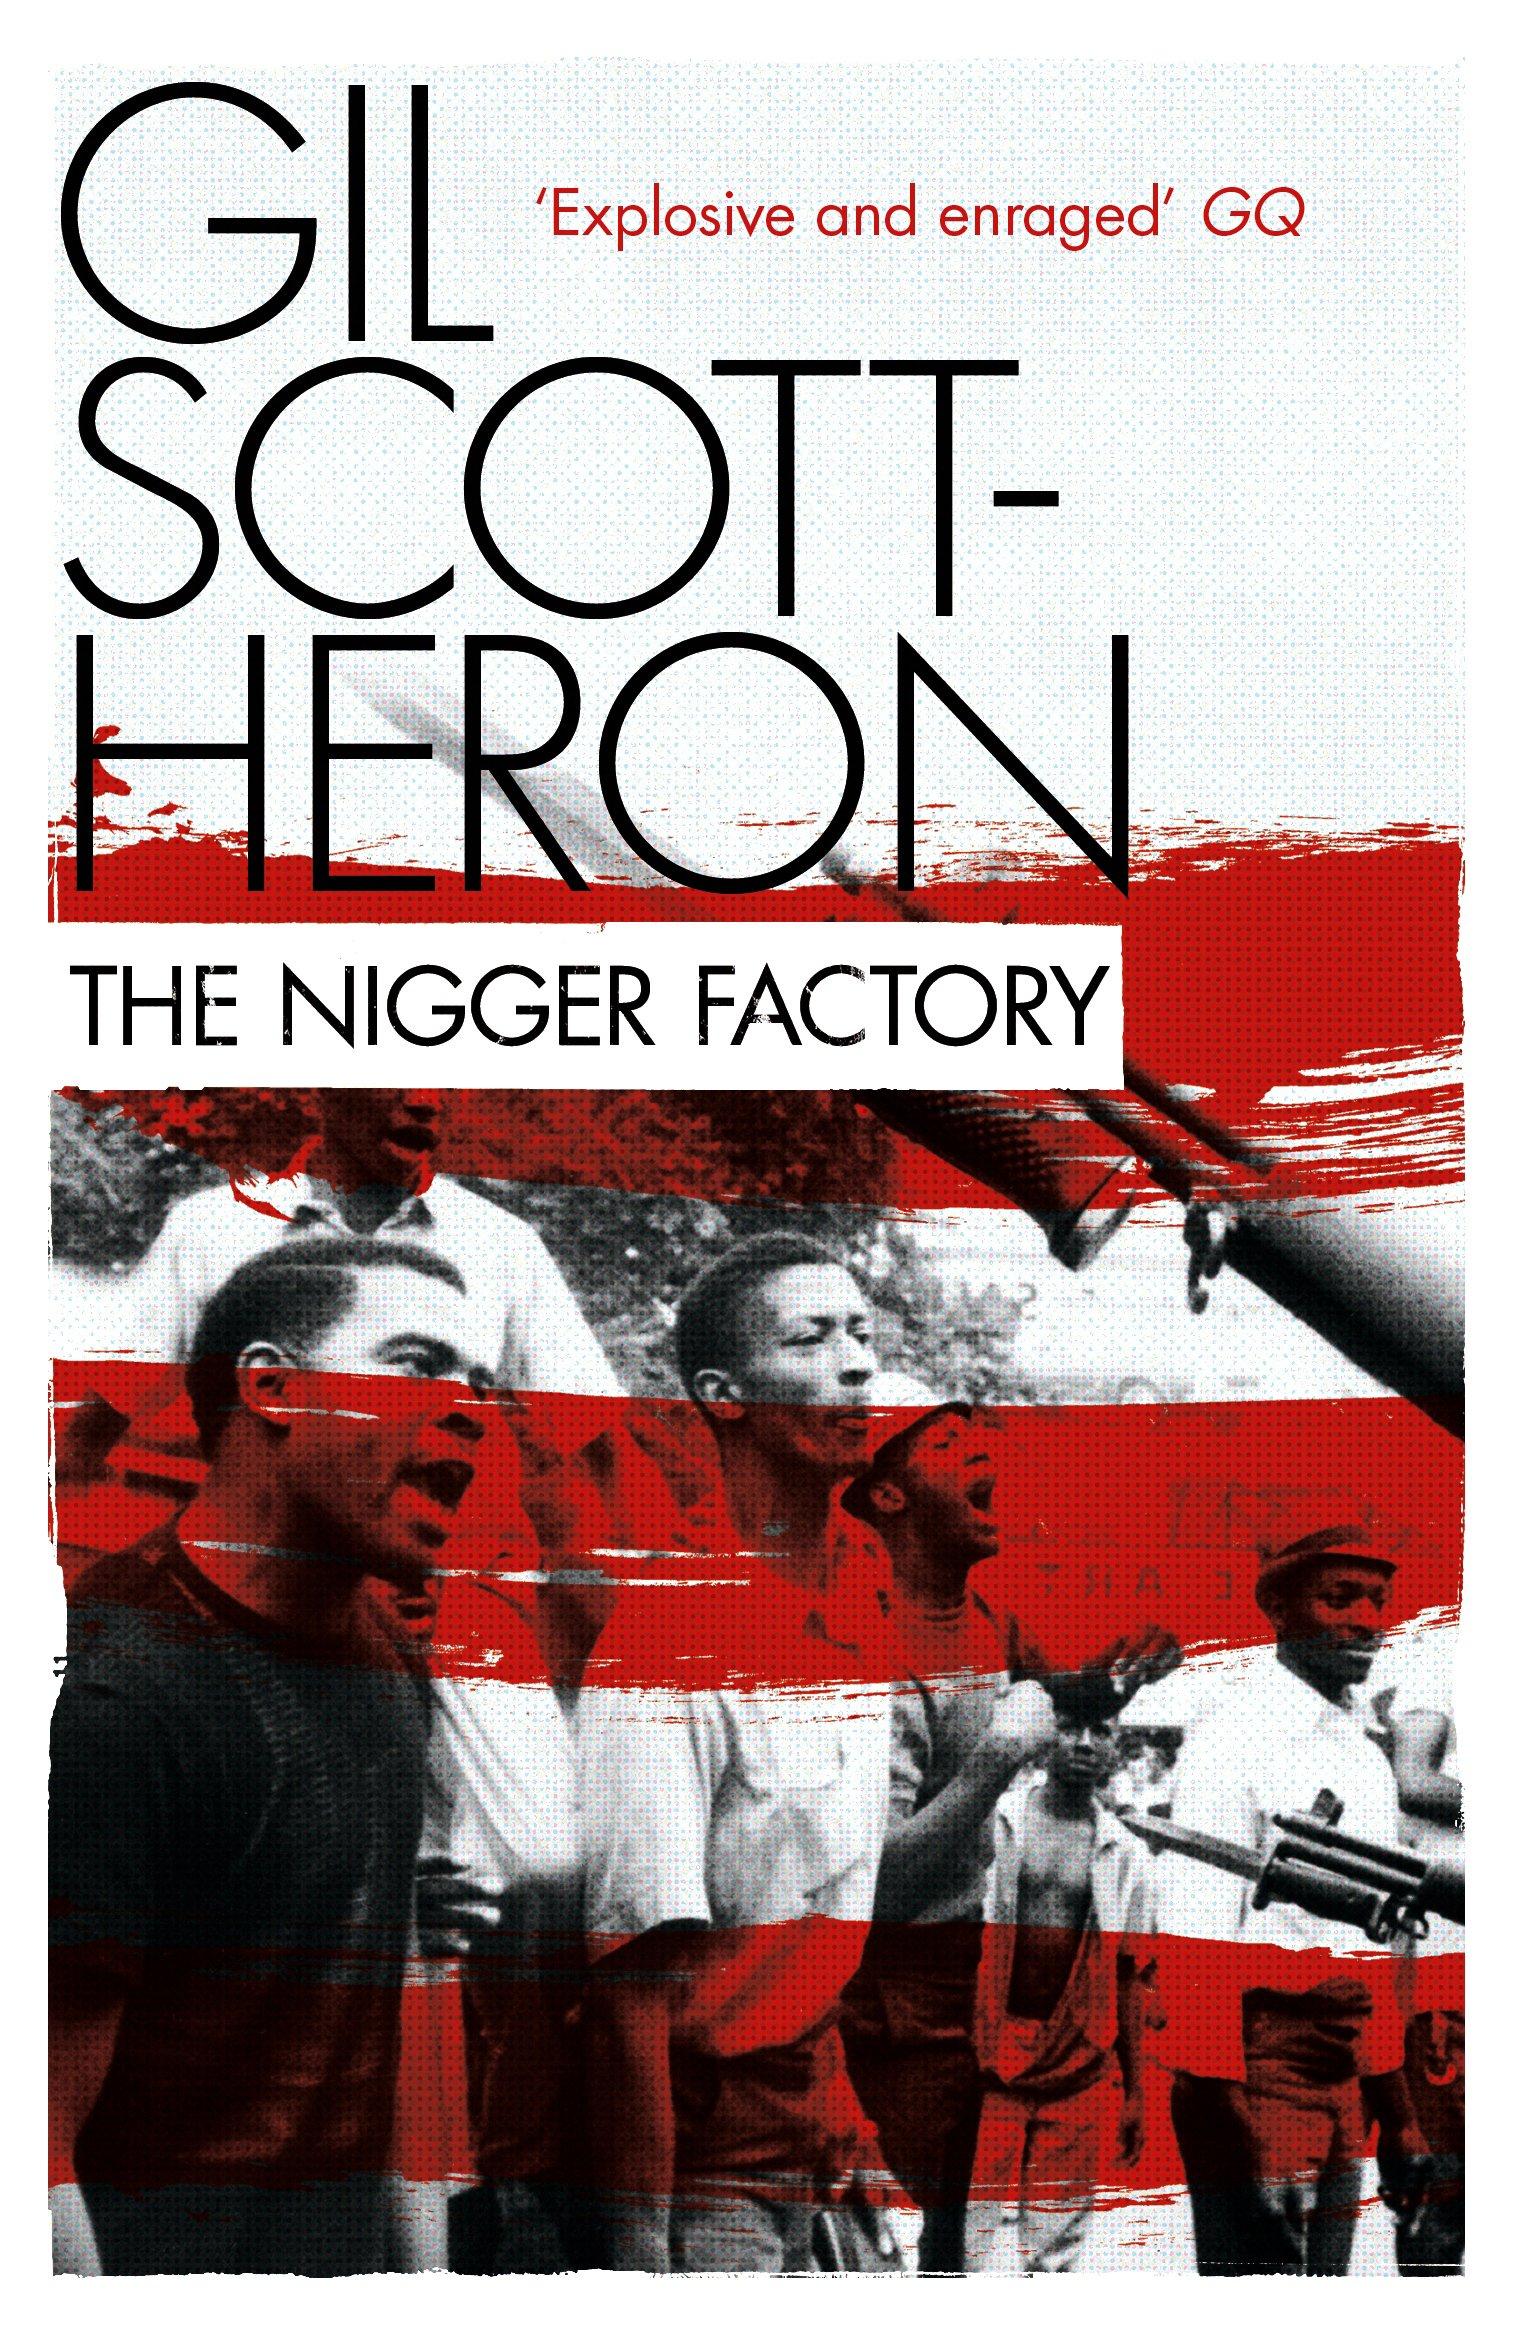 the nigger factory scott heron gil